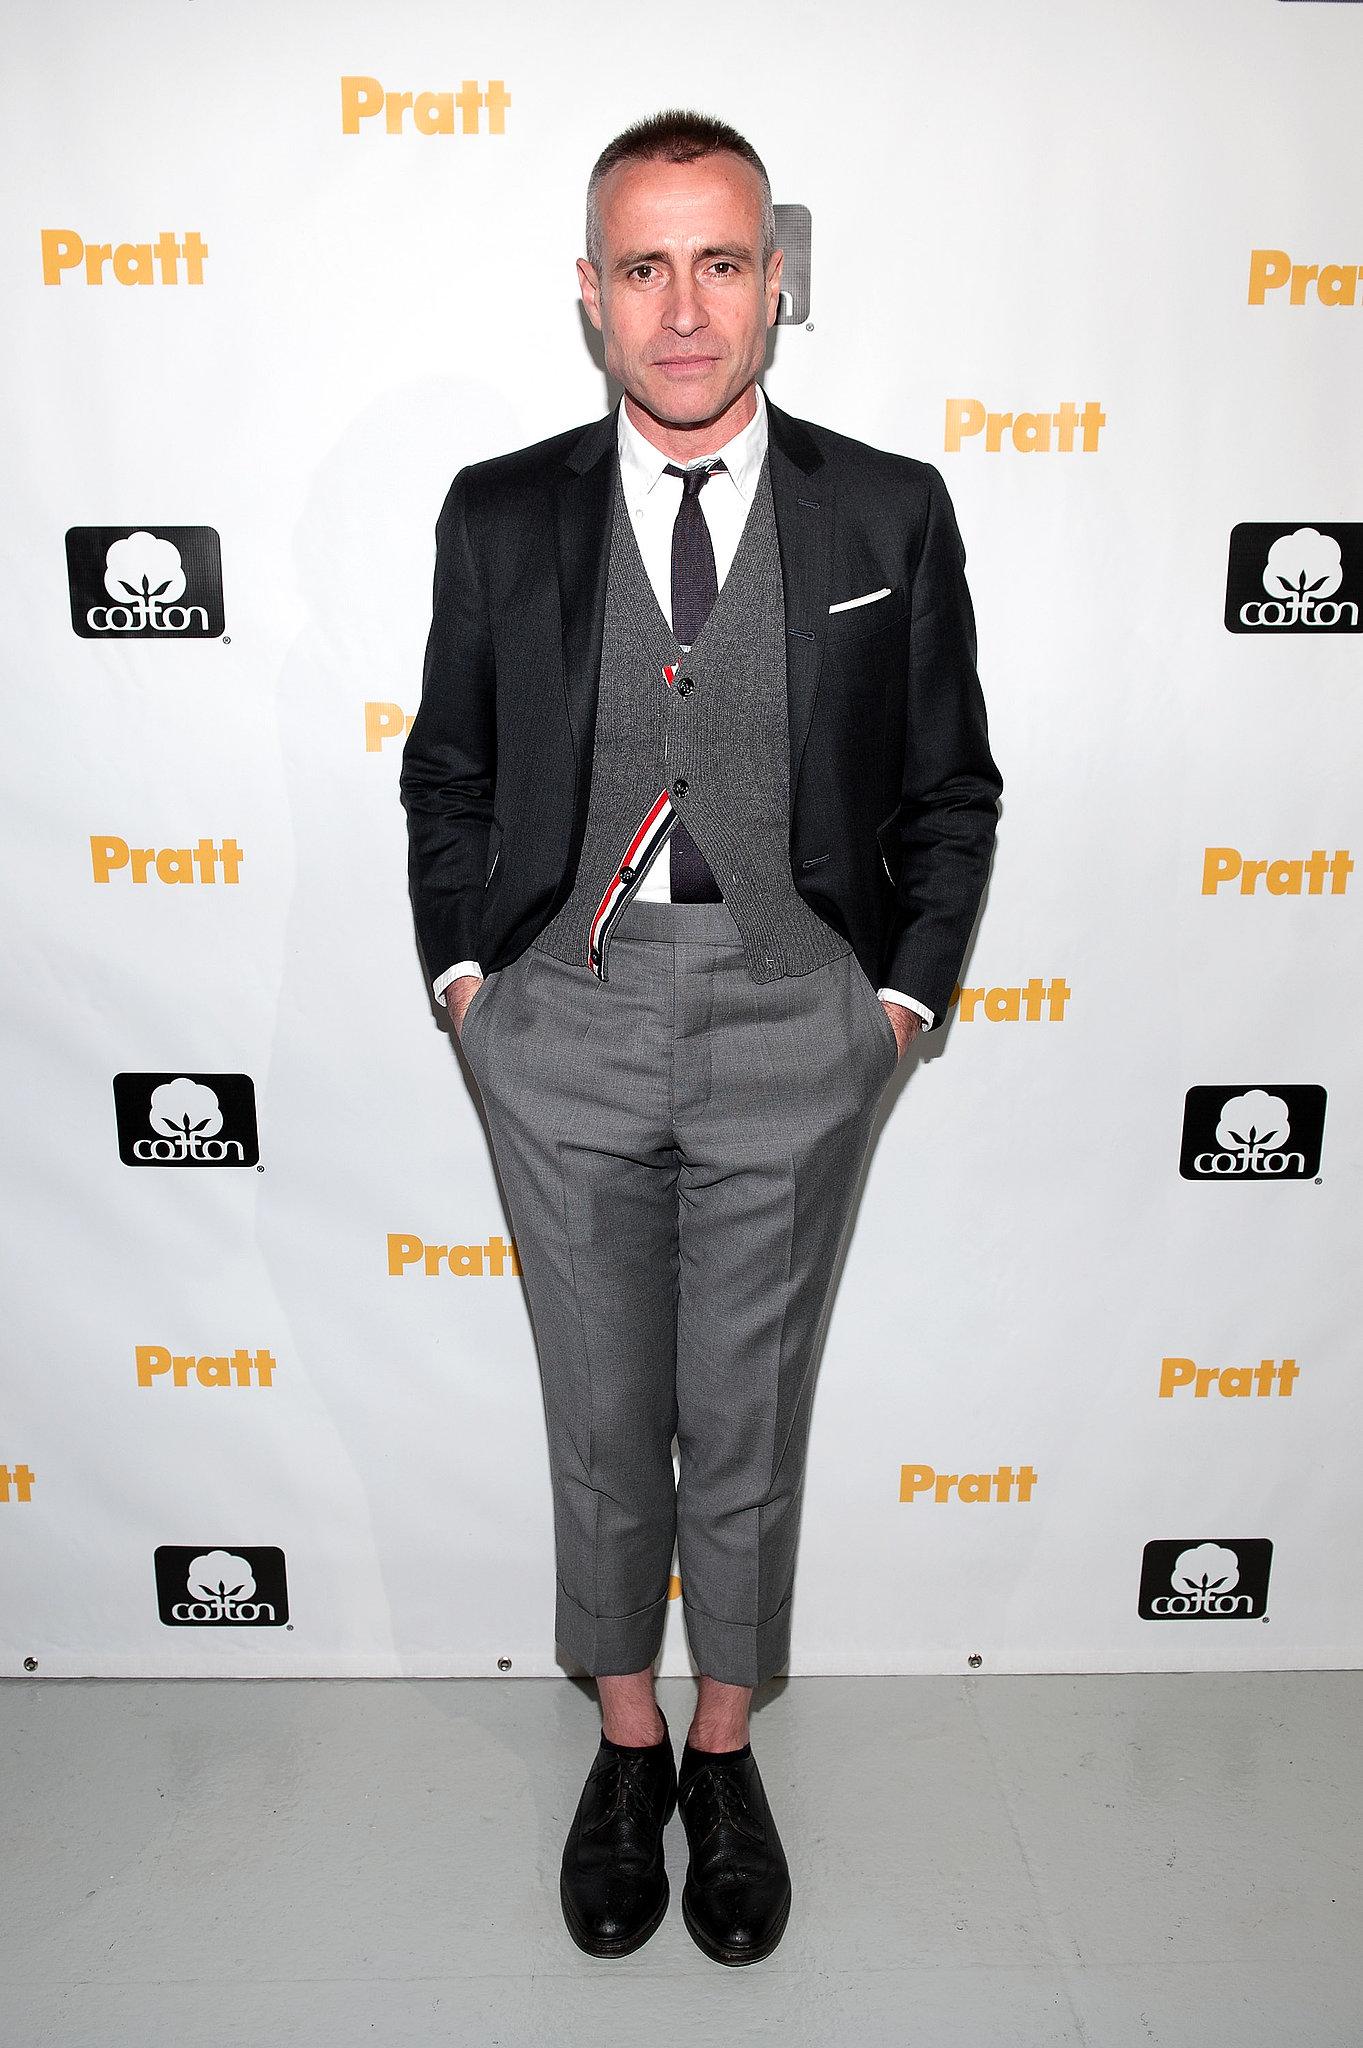 Thom Browne at the 114th annual Pratt Institute Fashion Show & Award Presentation in New York.